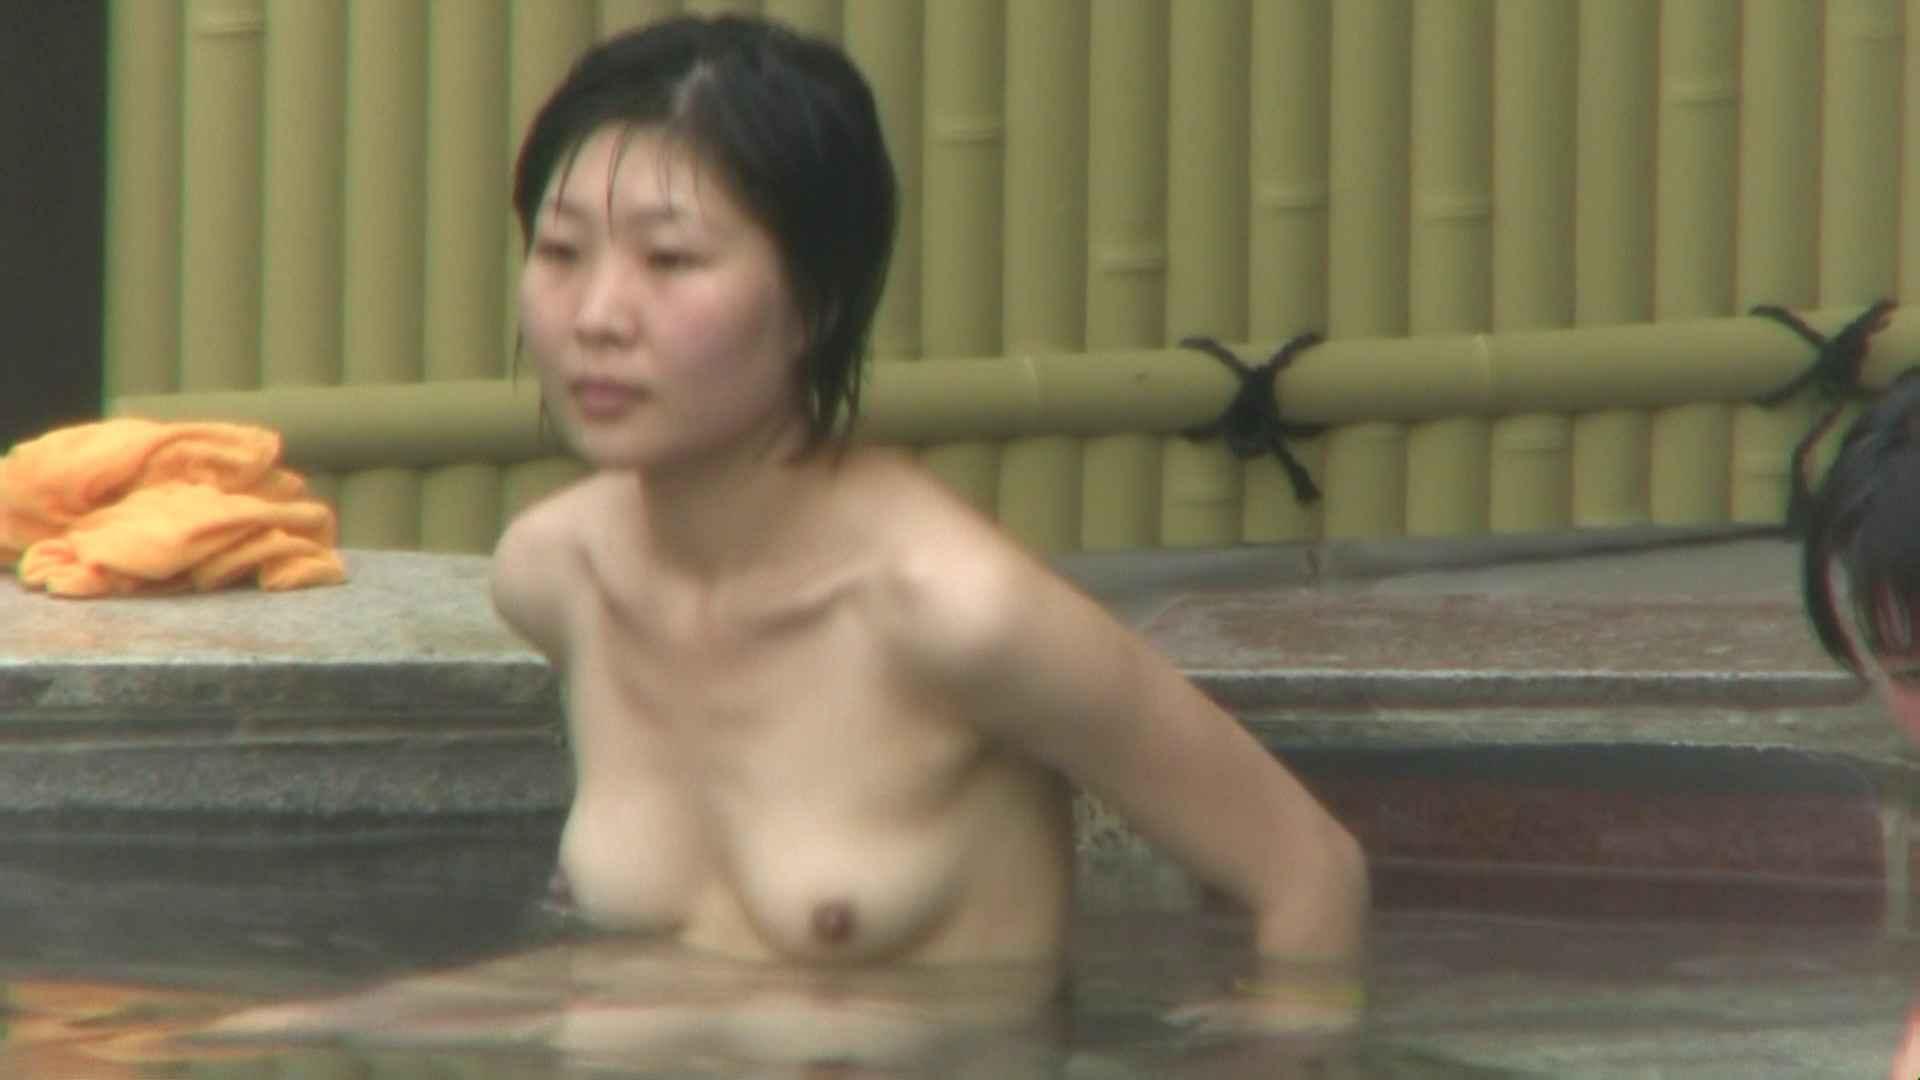 Aquaな露天風呂Vol.75【VIP限定】 露天風呂編 | 盗撮シリーズ  99PIX 97